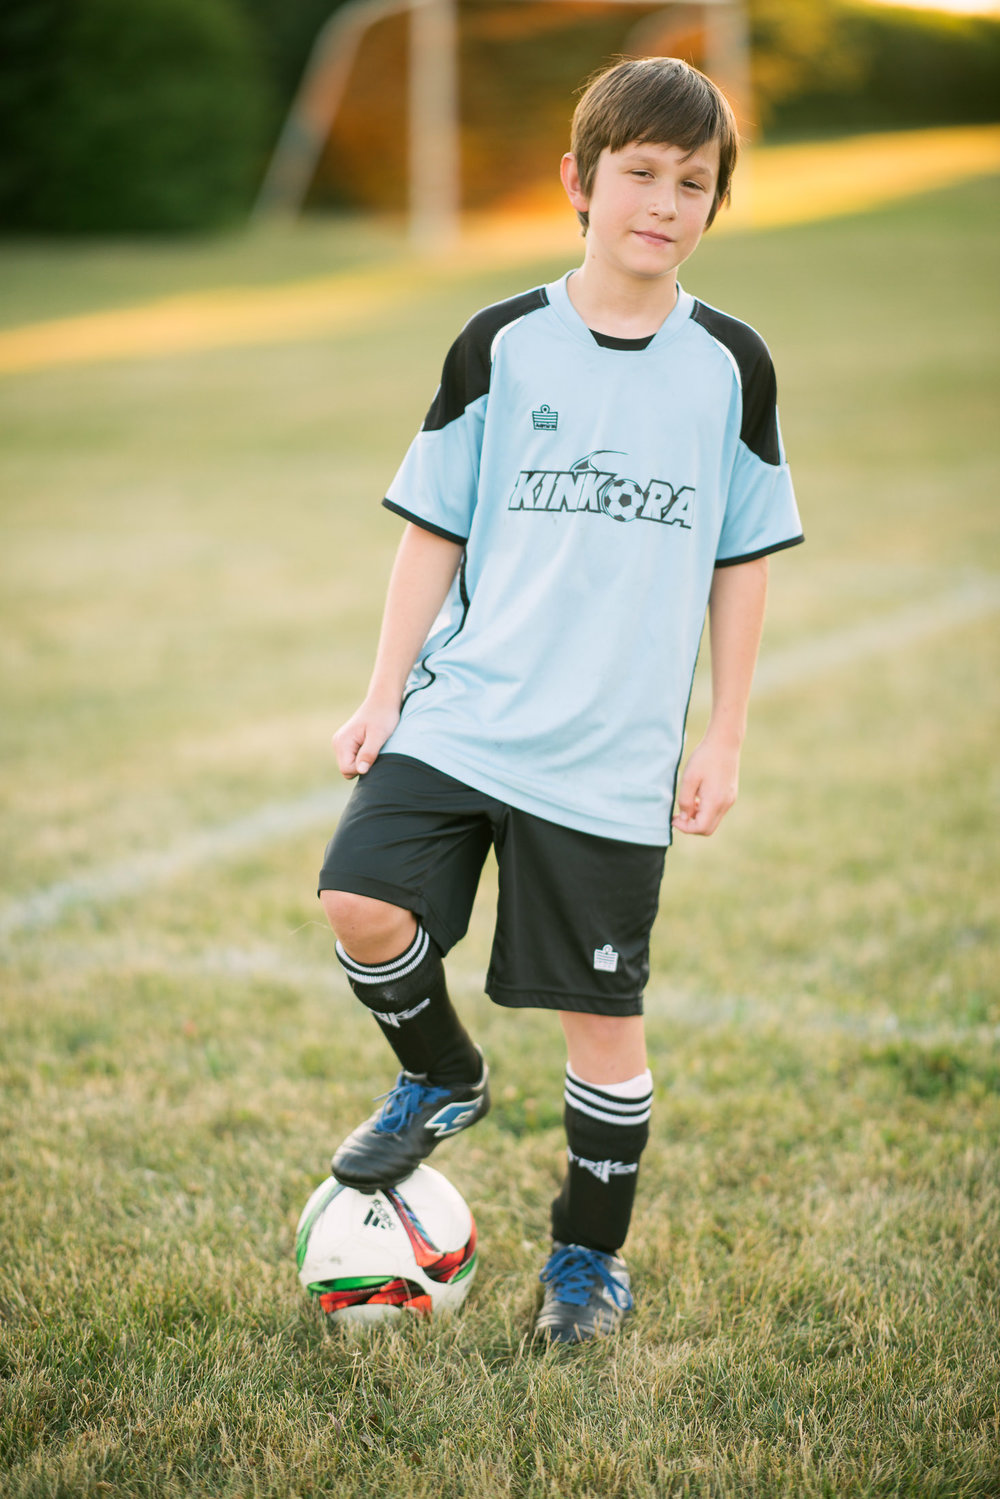 Kinkora-Soccer-Photos-076.jpg